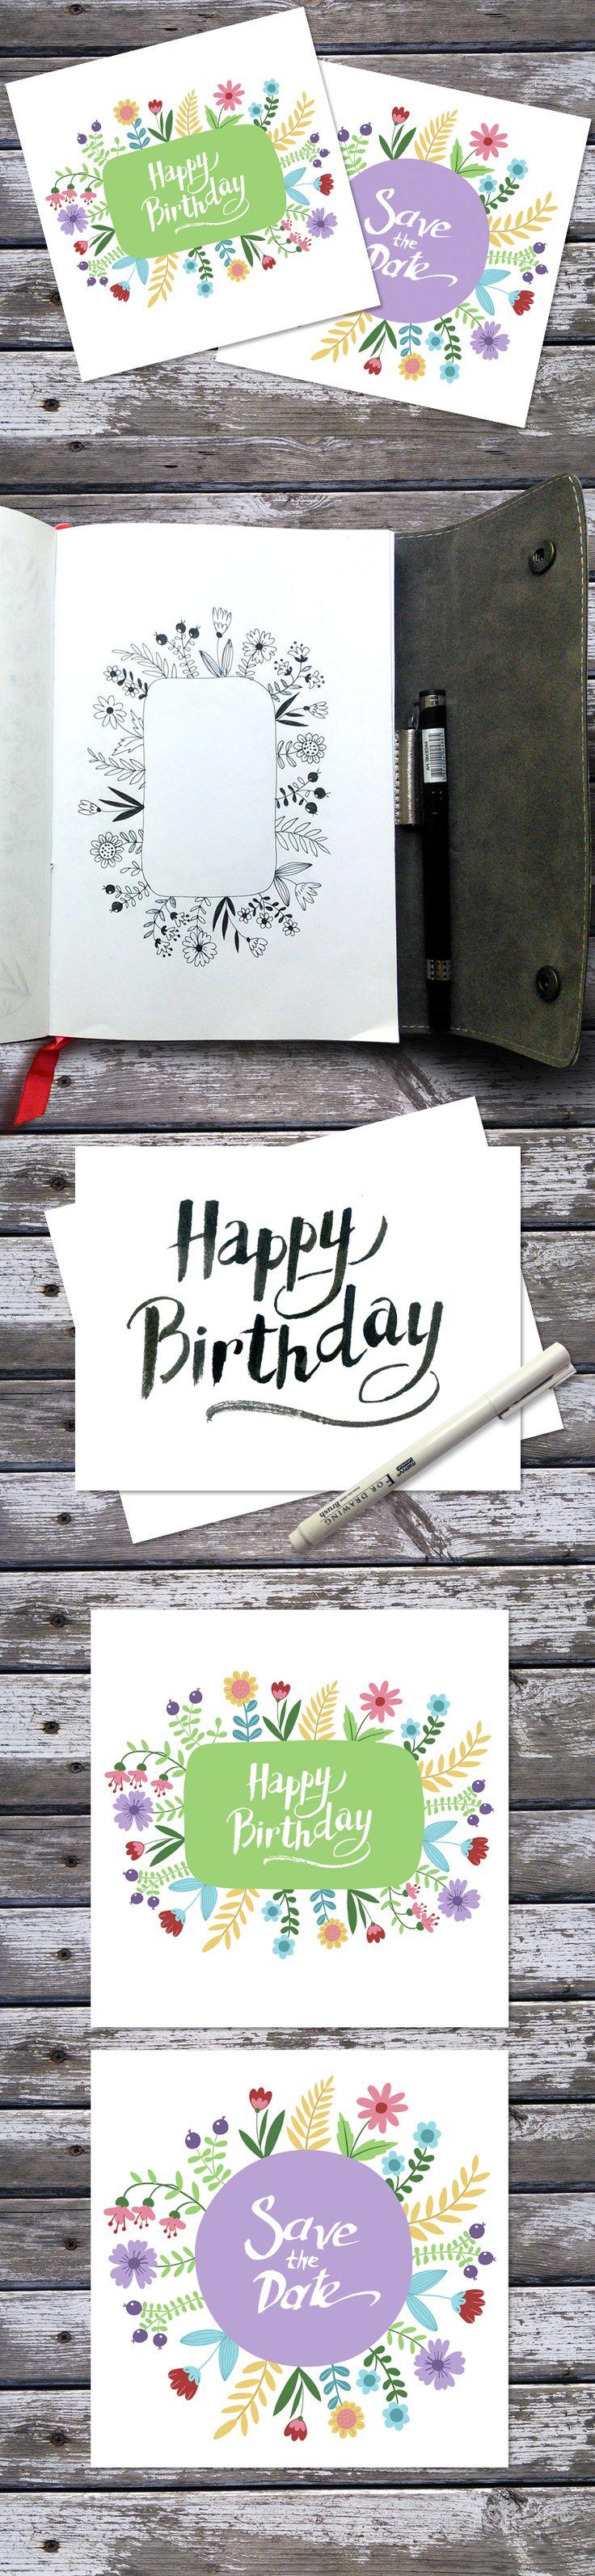 14 best samira images on pinterest birthday invitations happy birthday invitation card on behance stopboris Image collections